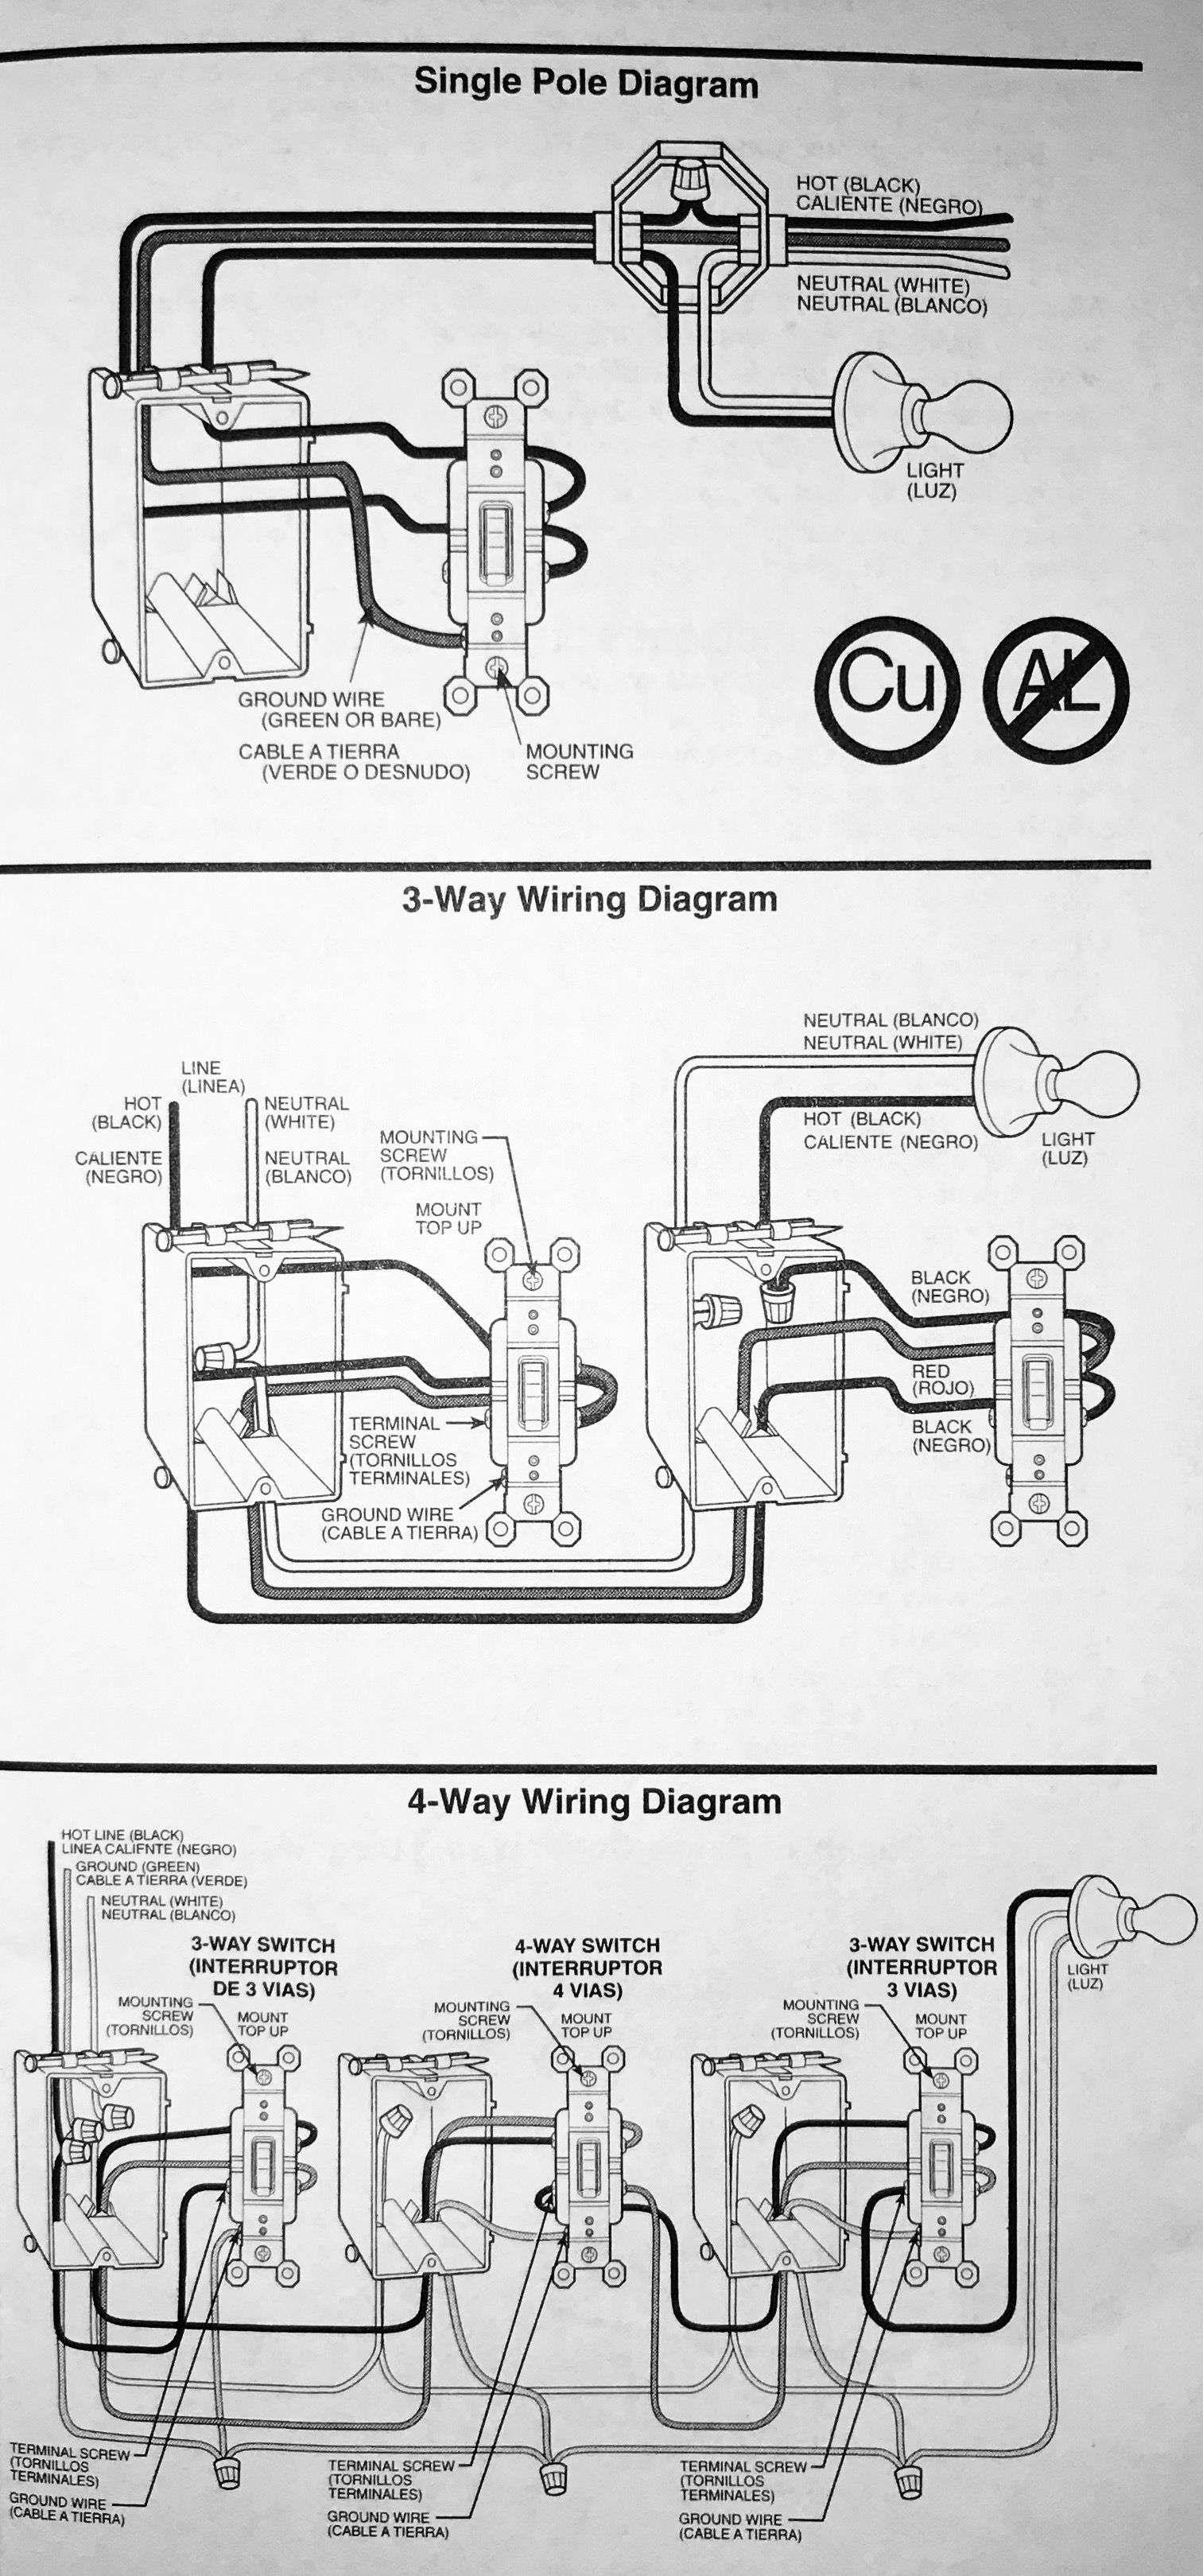 wiring diagram 3 way switch inspirational installation of single pole 3 way 4 way switches wiring [ 1513 x 3239 Pixel ]